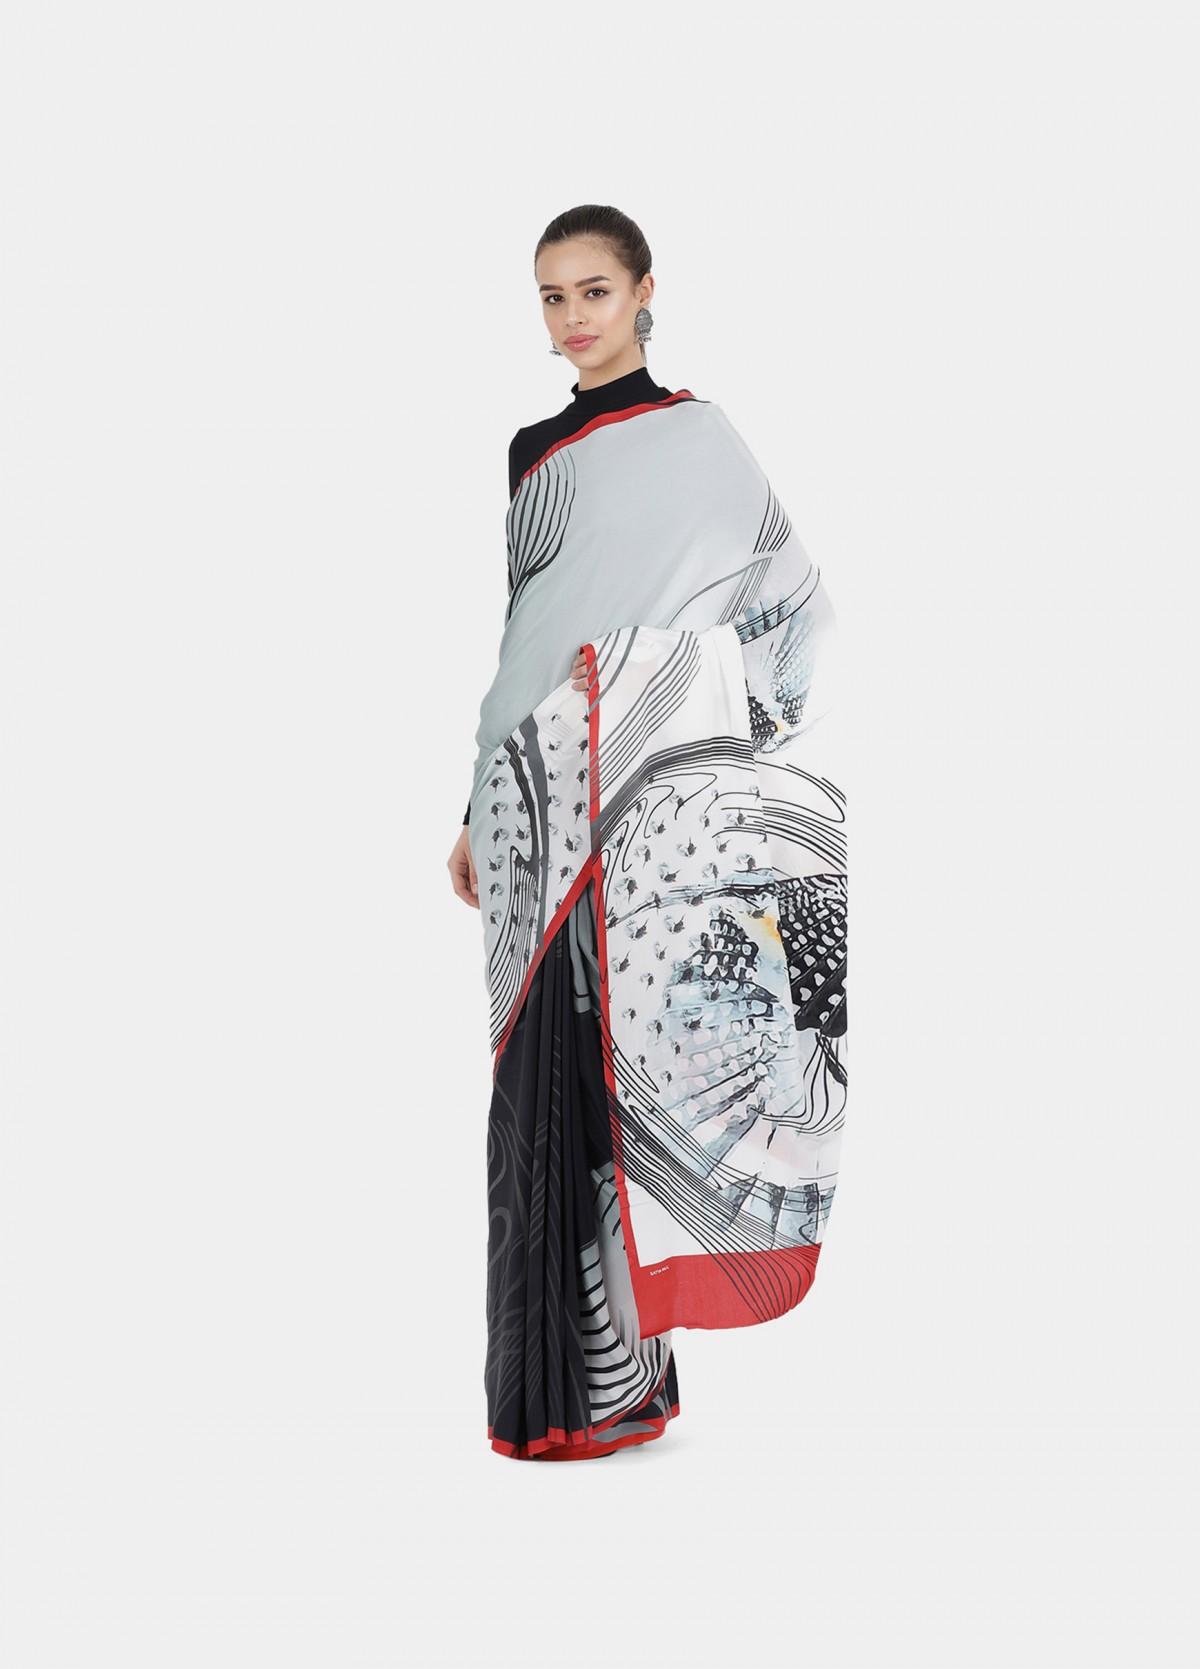 The Manakin Sari